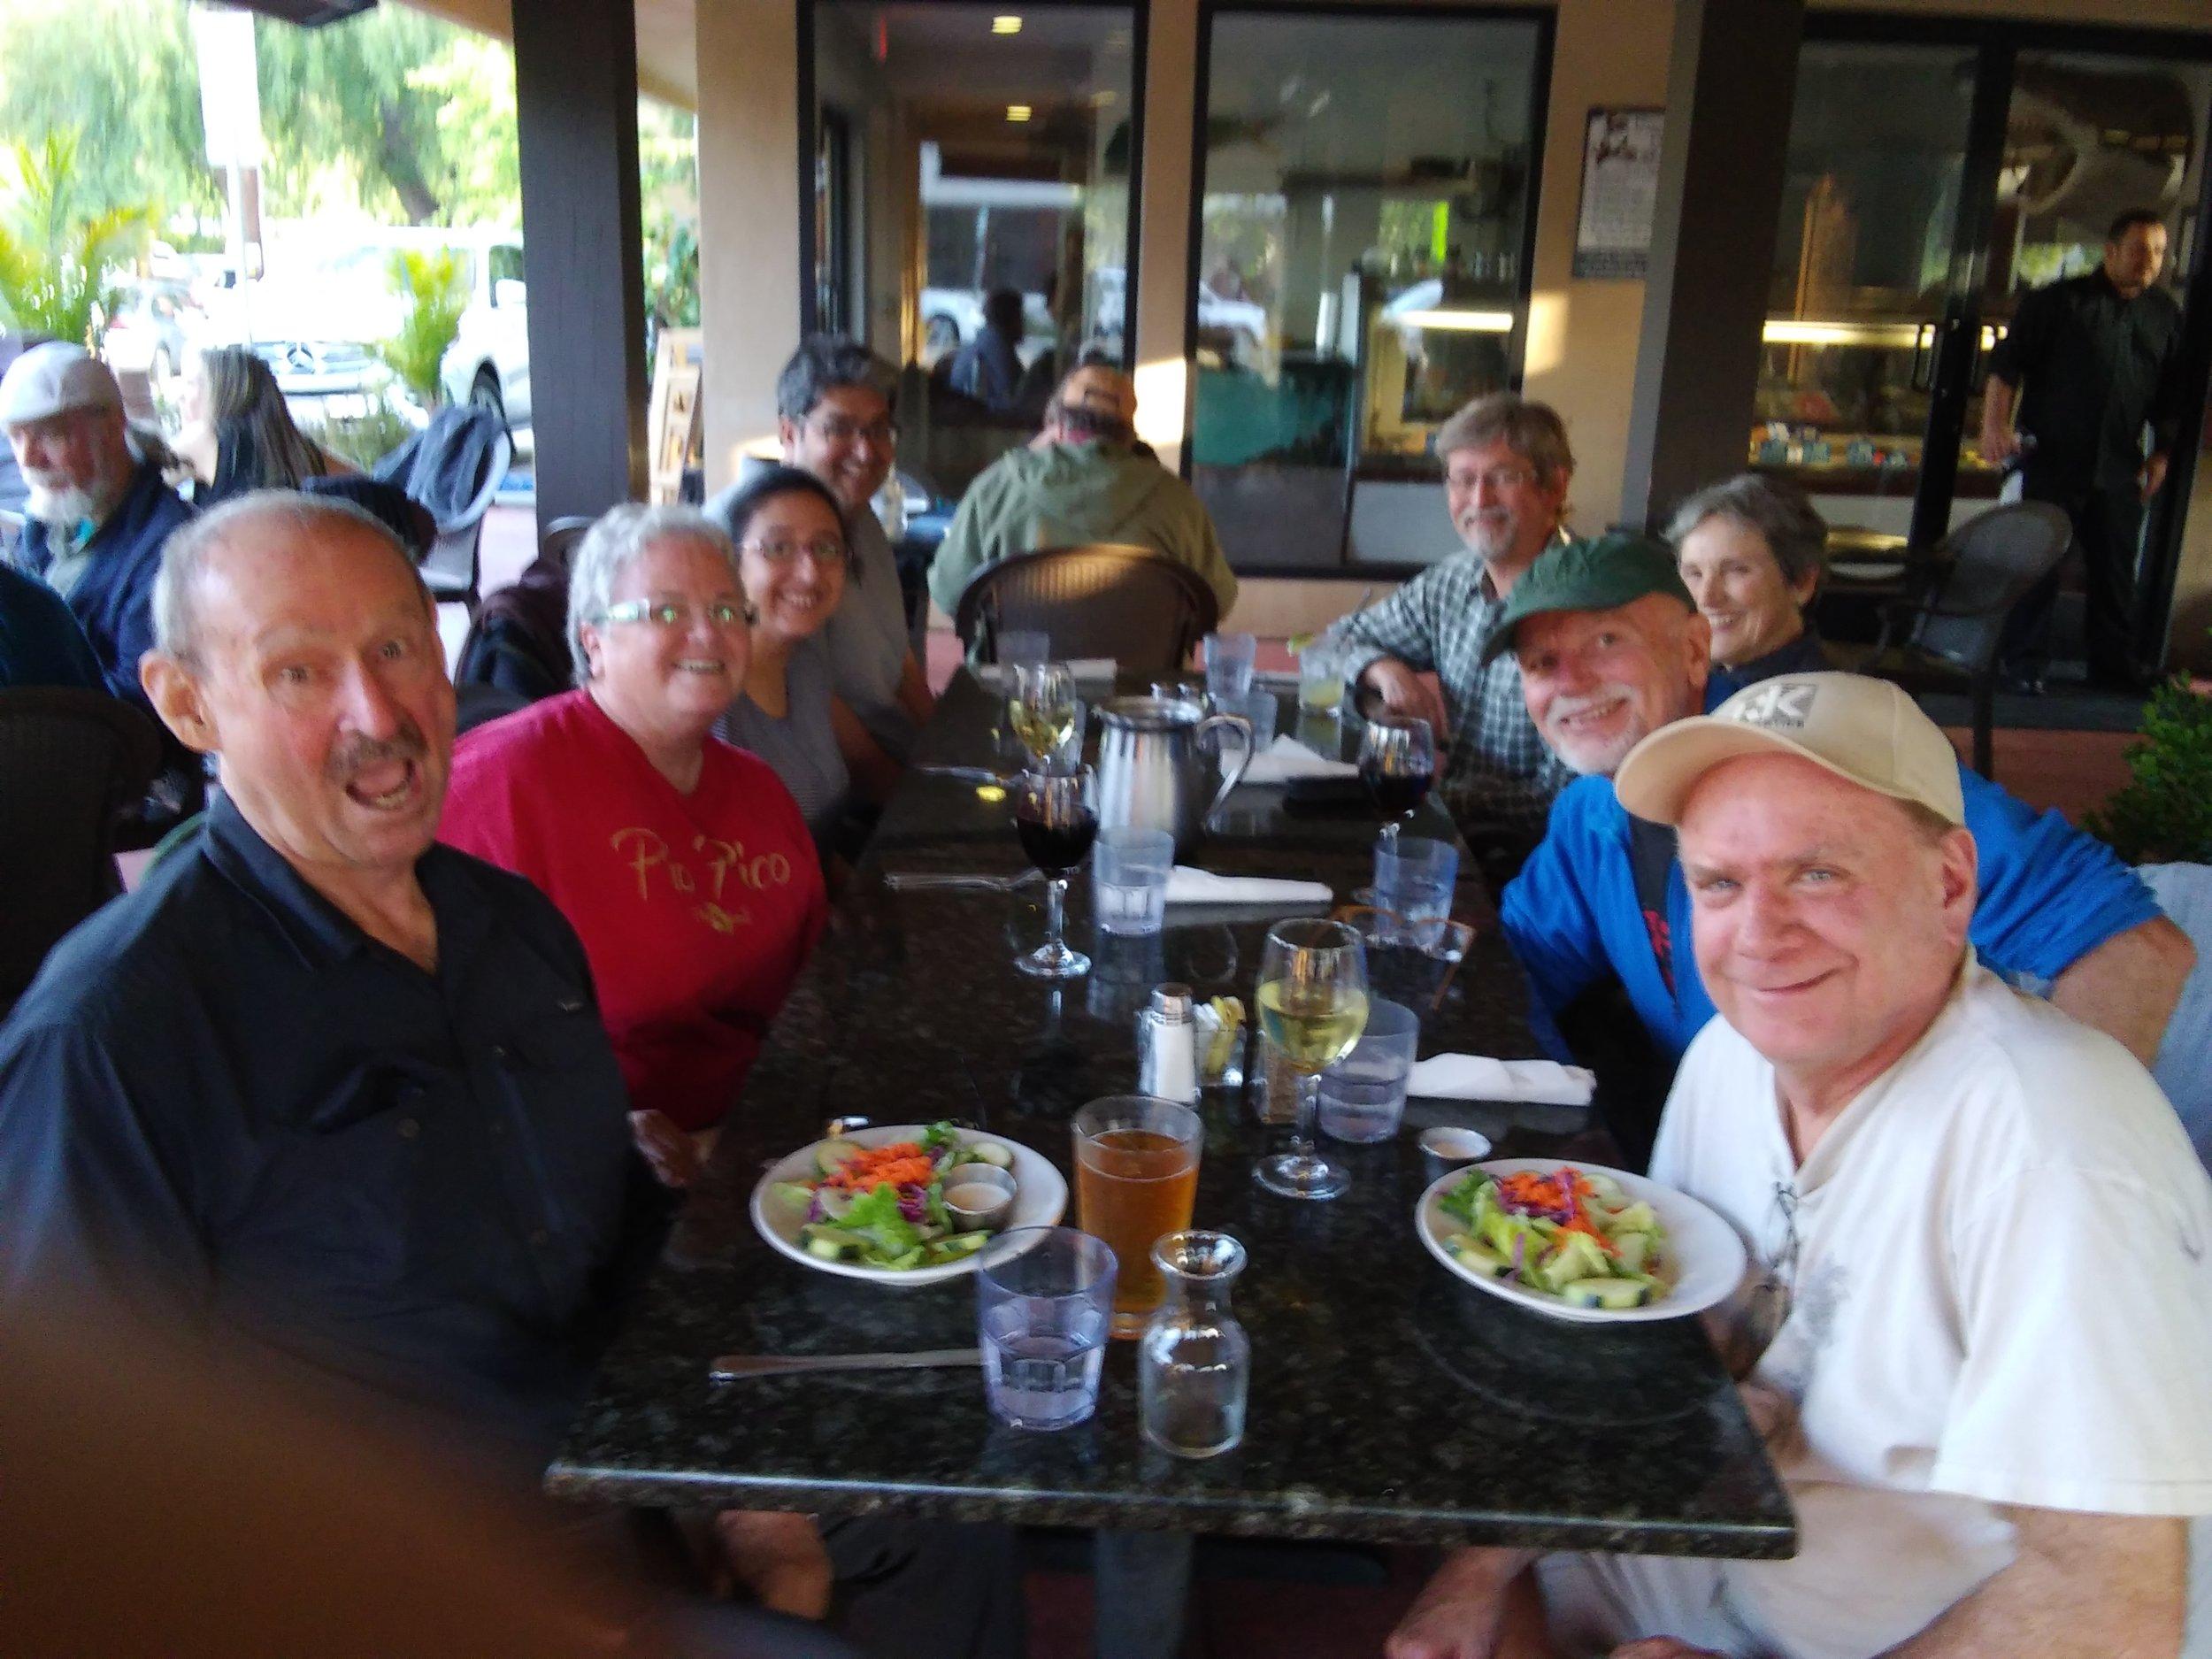 RELAXING AFTER A HARD DAY'S WORK at Sea Fresh Restaurant in Ojai. (Left to right) Sam Ervin, Cassandra Bramucci, Khushnam Crawford, Homayar Gandhi, Eric Turk, Margaret Magnus, Jim Whedon and Jim Whitson.